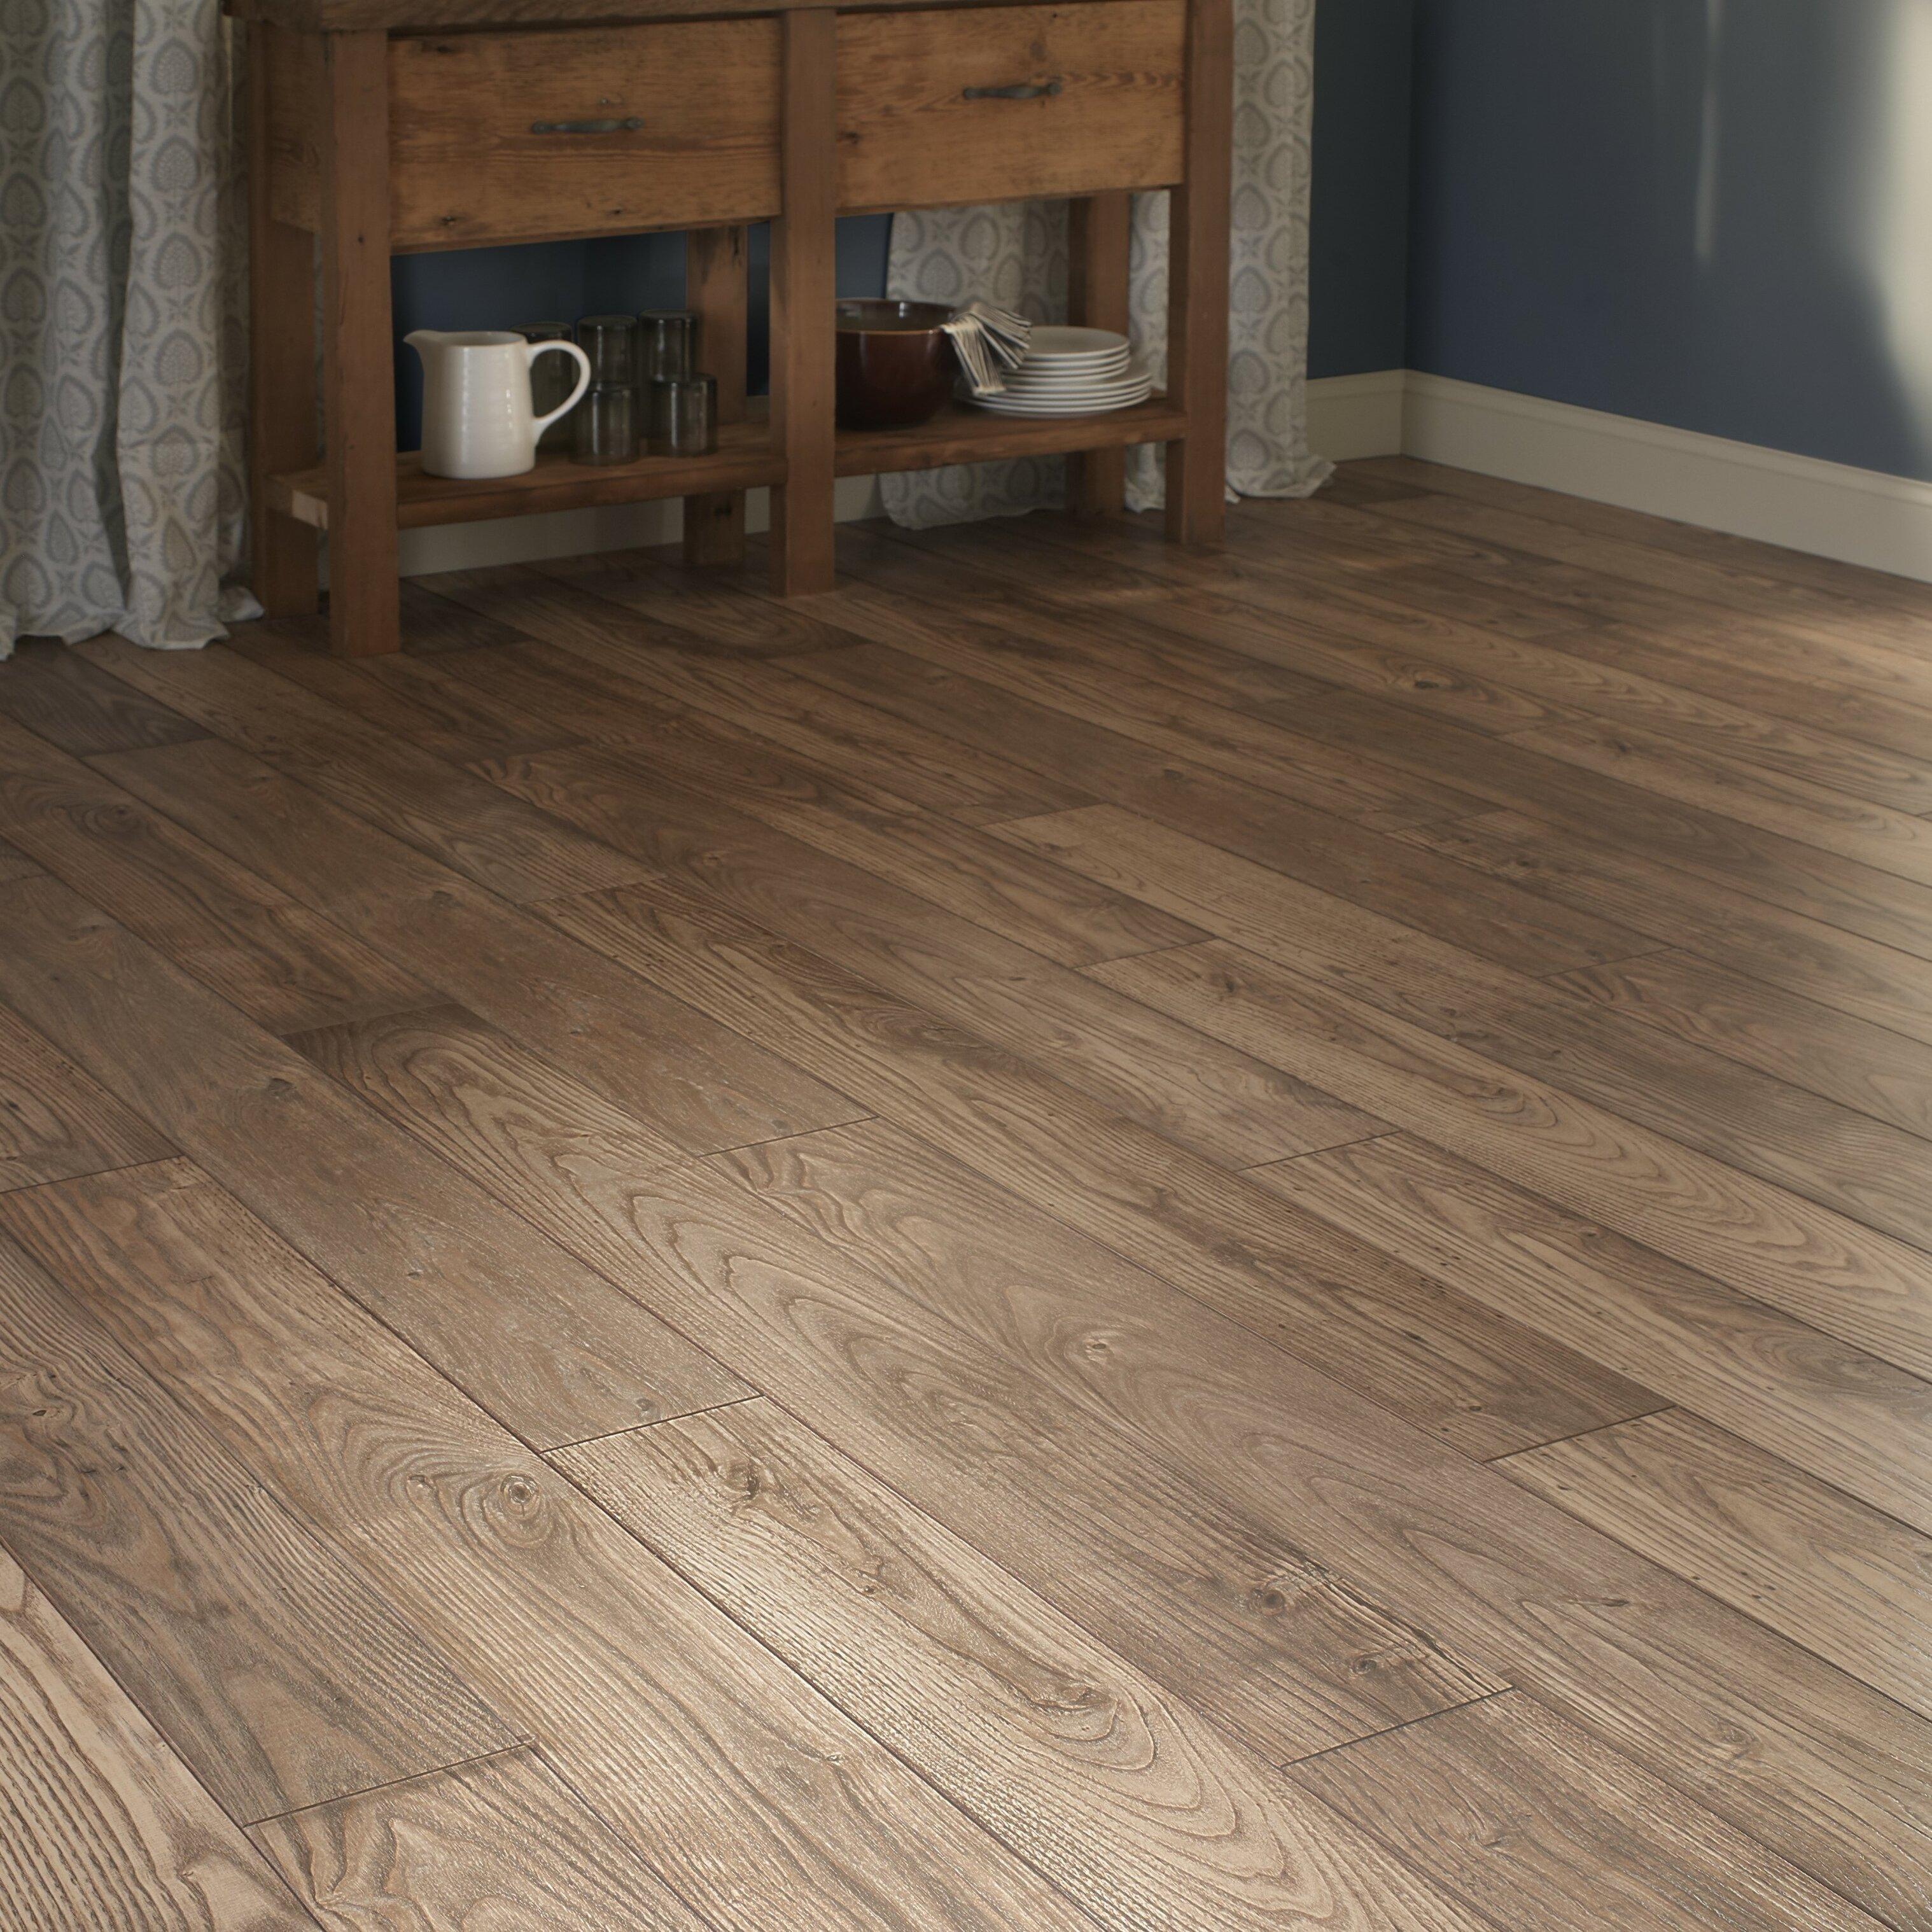 Mannington Restoration 6 X 51 12mm Chestnut Laminate Flooring In Natural Wayfair